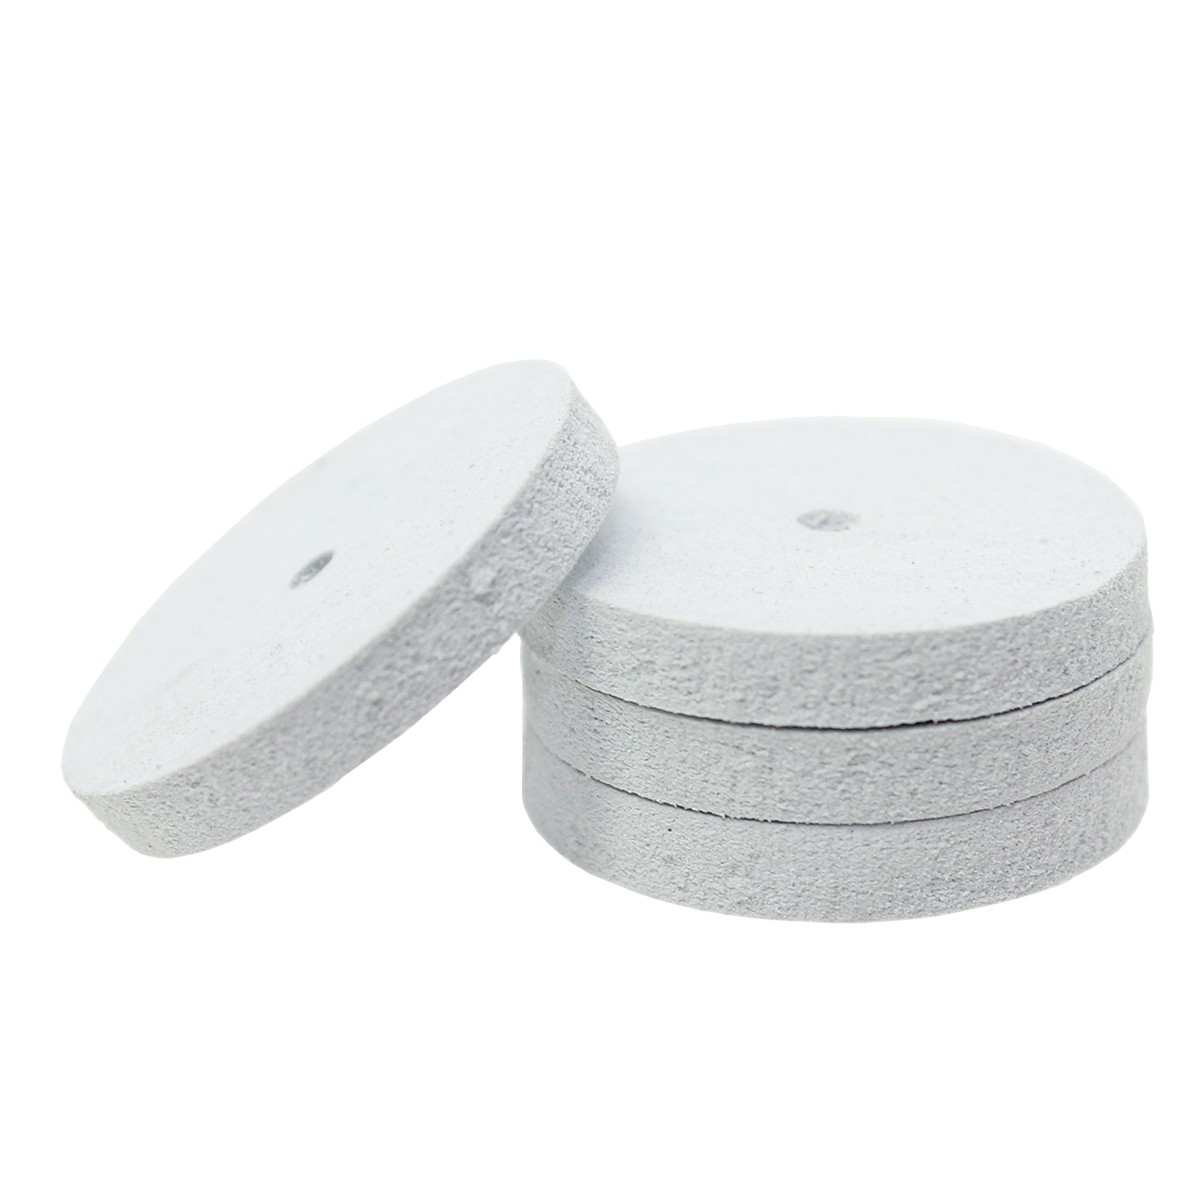 White Rubber Wheels - Extra Coarse